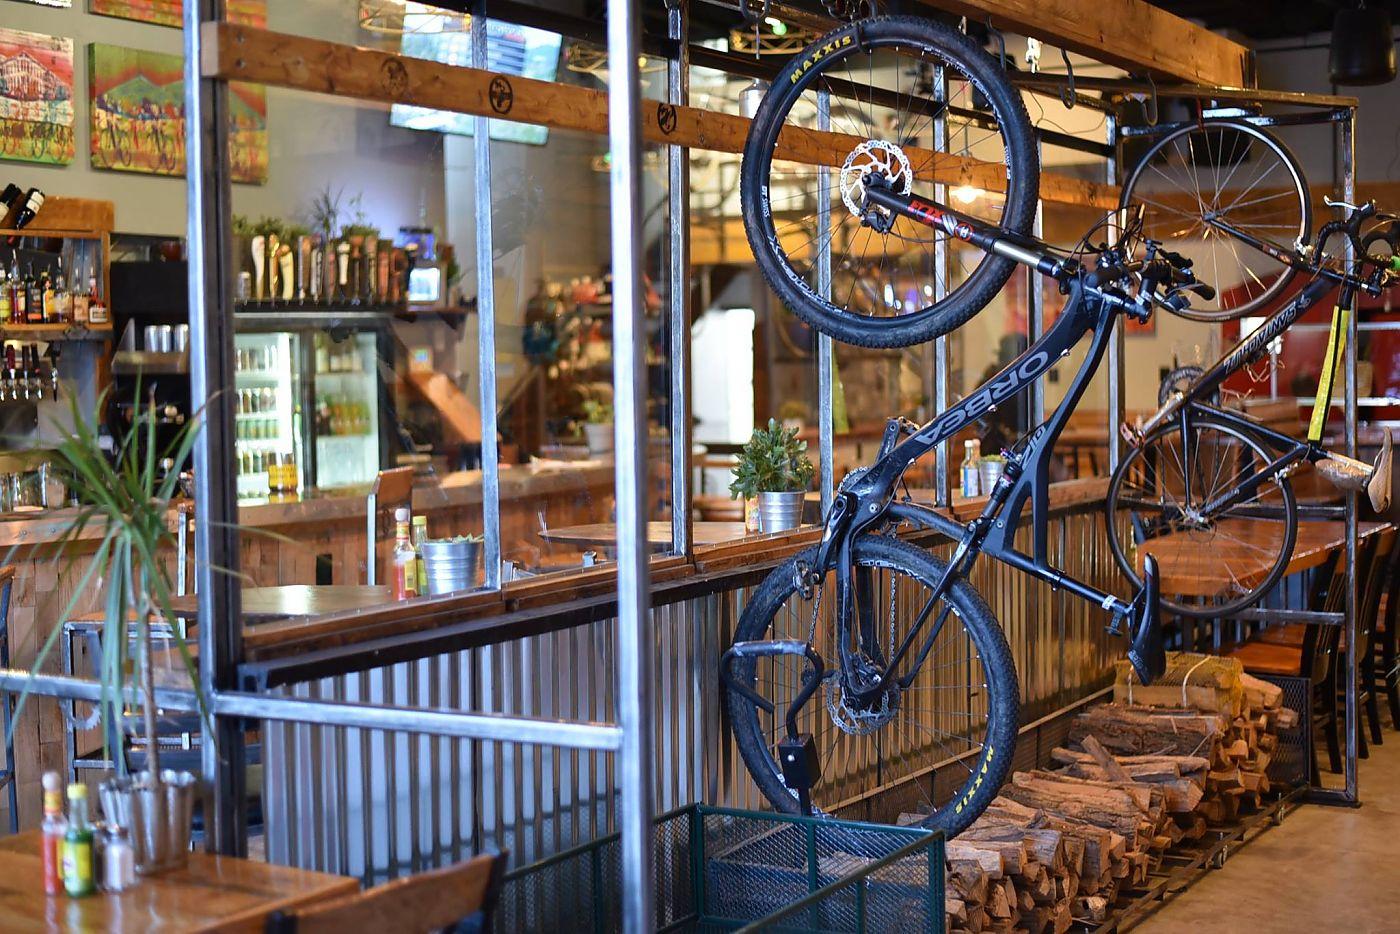 Mountain Bike Champion Marla Streb Opens Bike Shop And Cafe